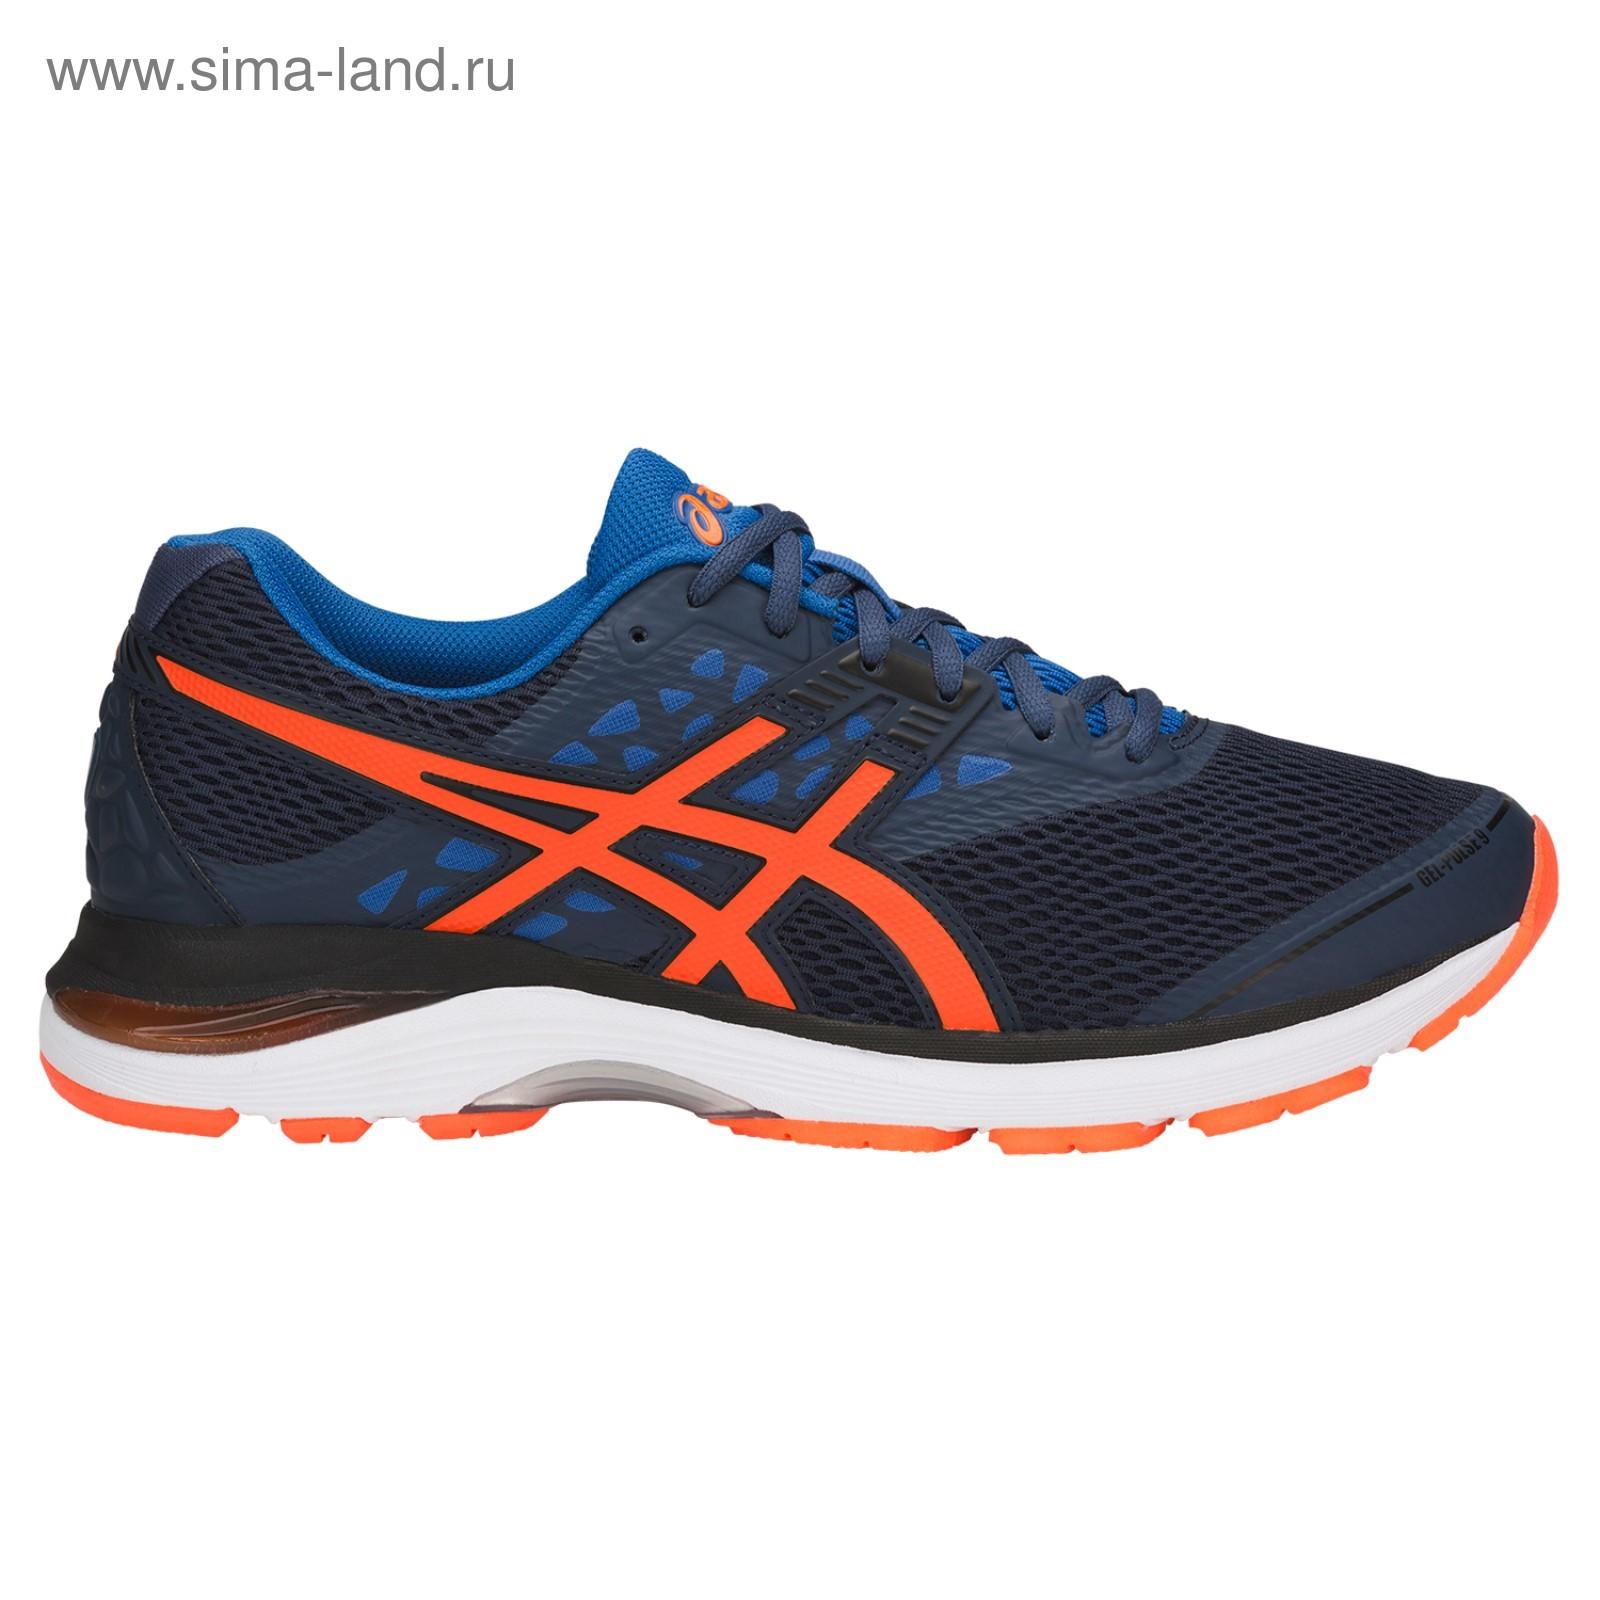 ASICS T7D3N 4930 GEL-PULSE 9 Кроссовки 6 (3731257) - Купить по цене ... e80f76bcedc0f